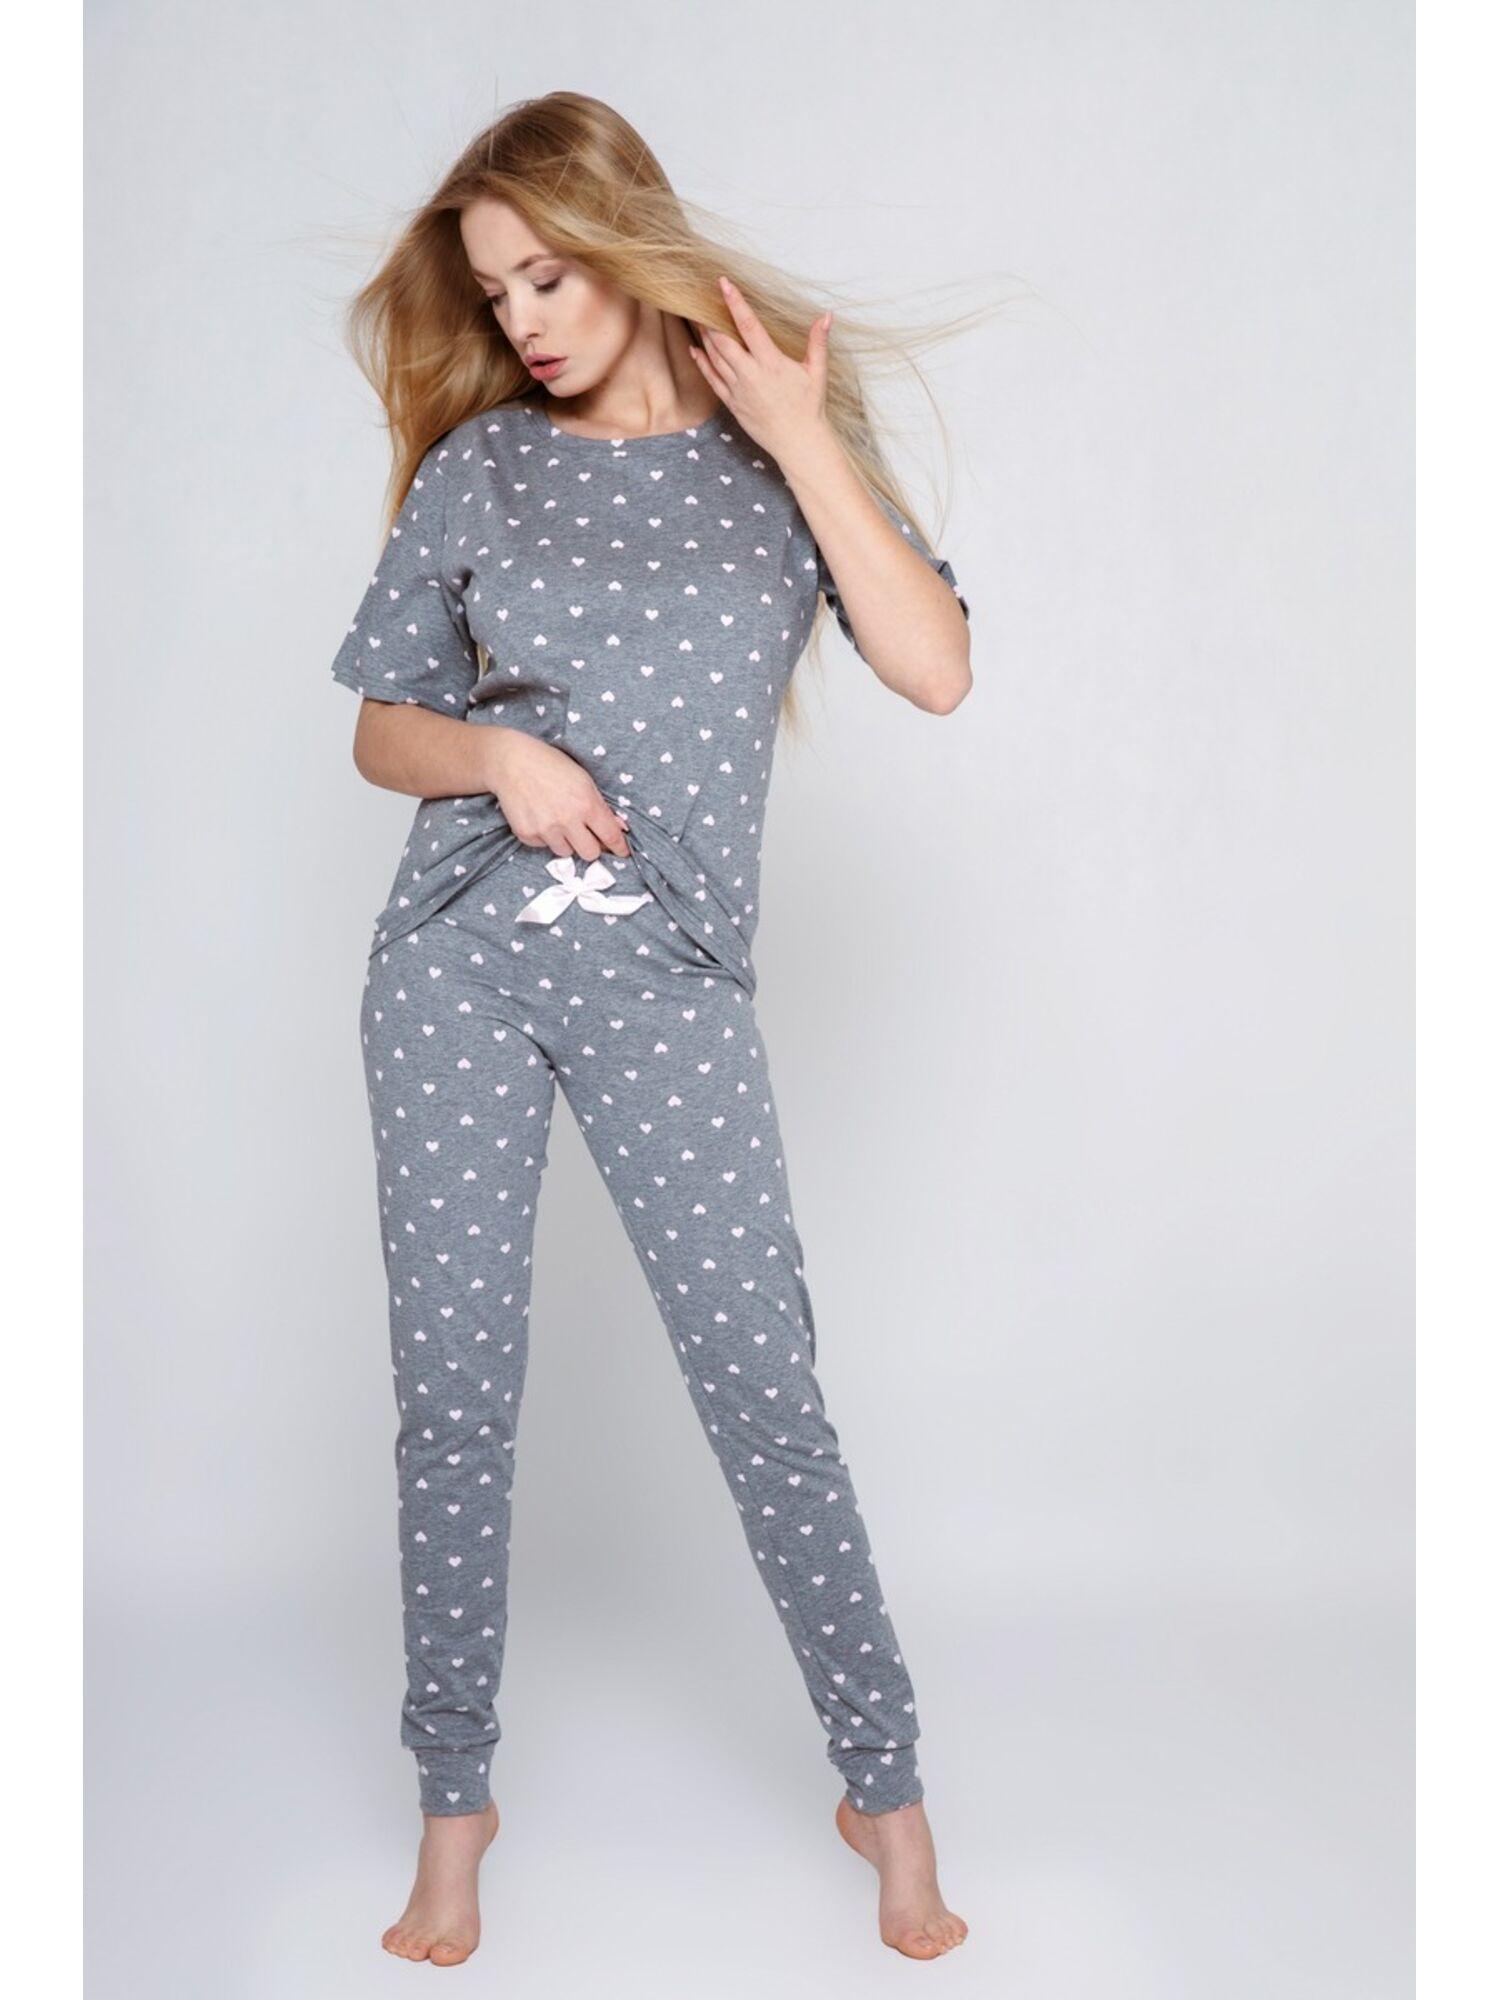 Пижама женская со штанами CRISTINE, серый, Sensis